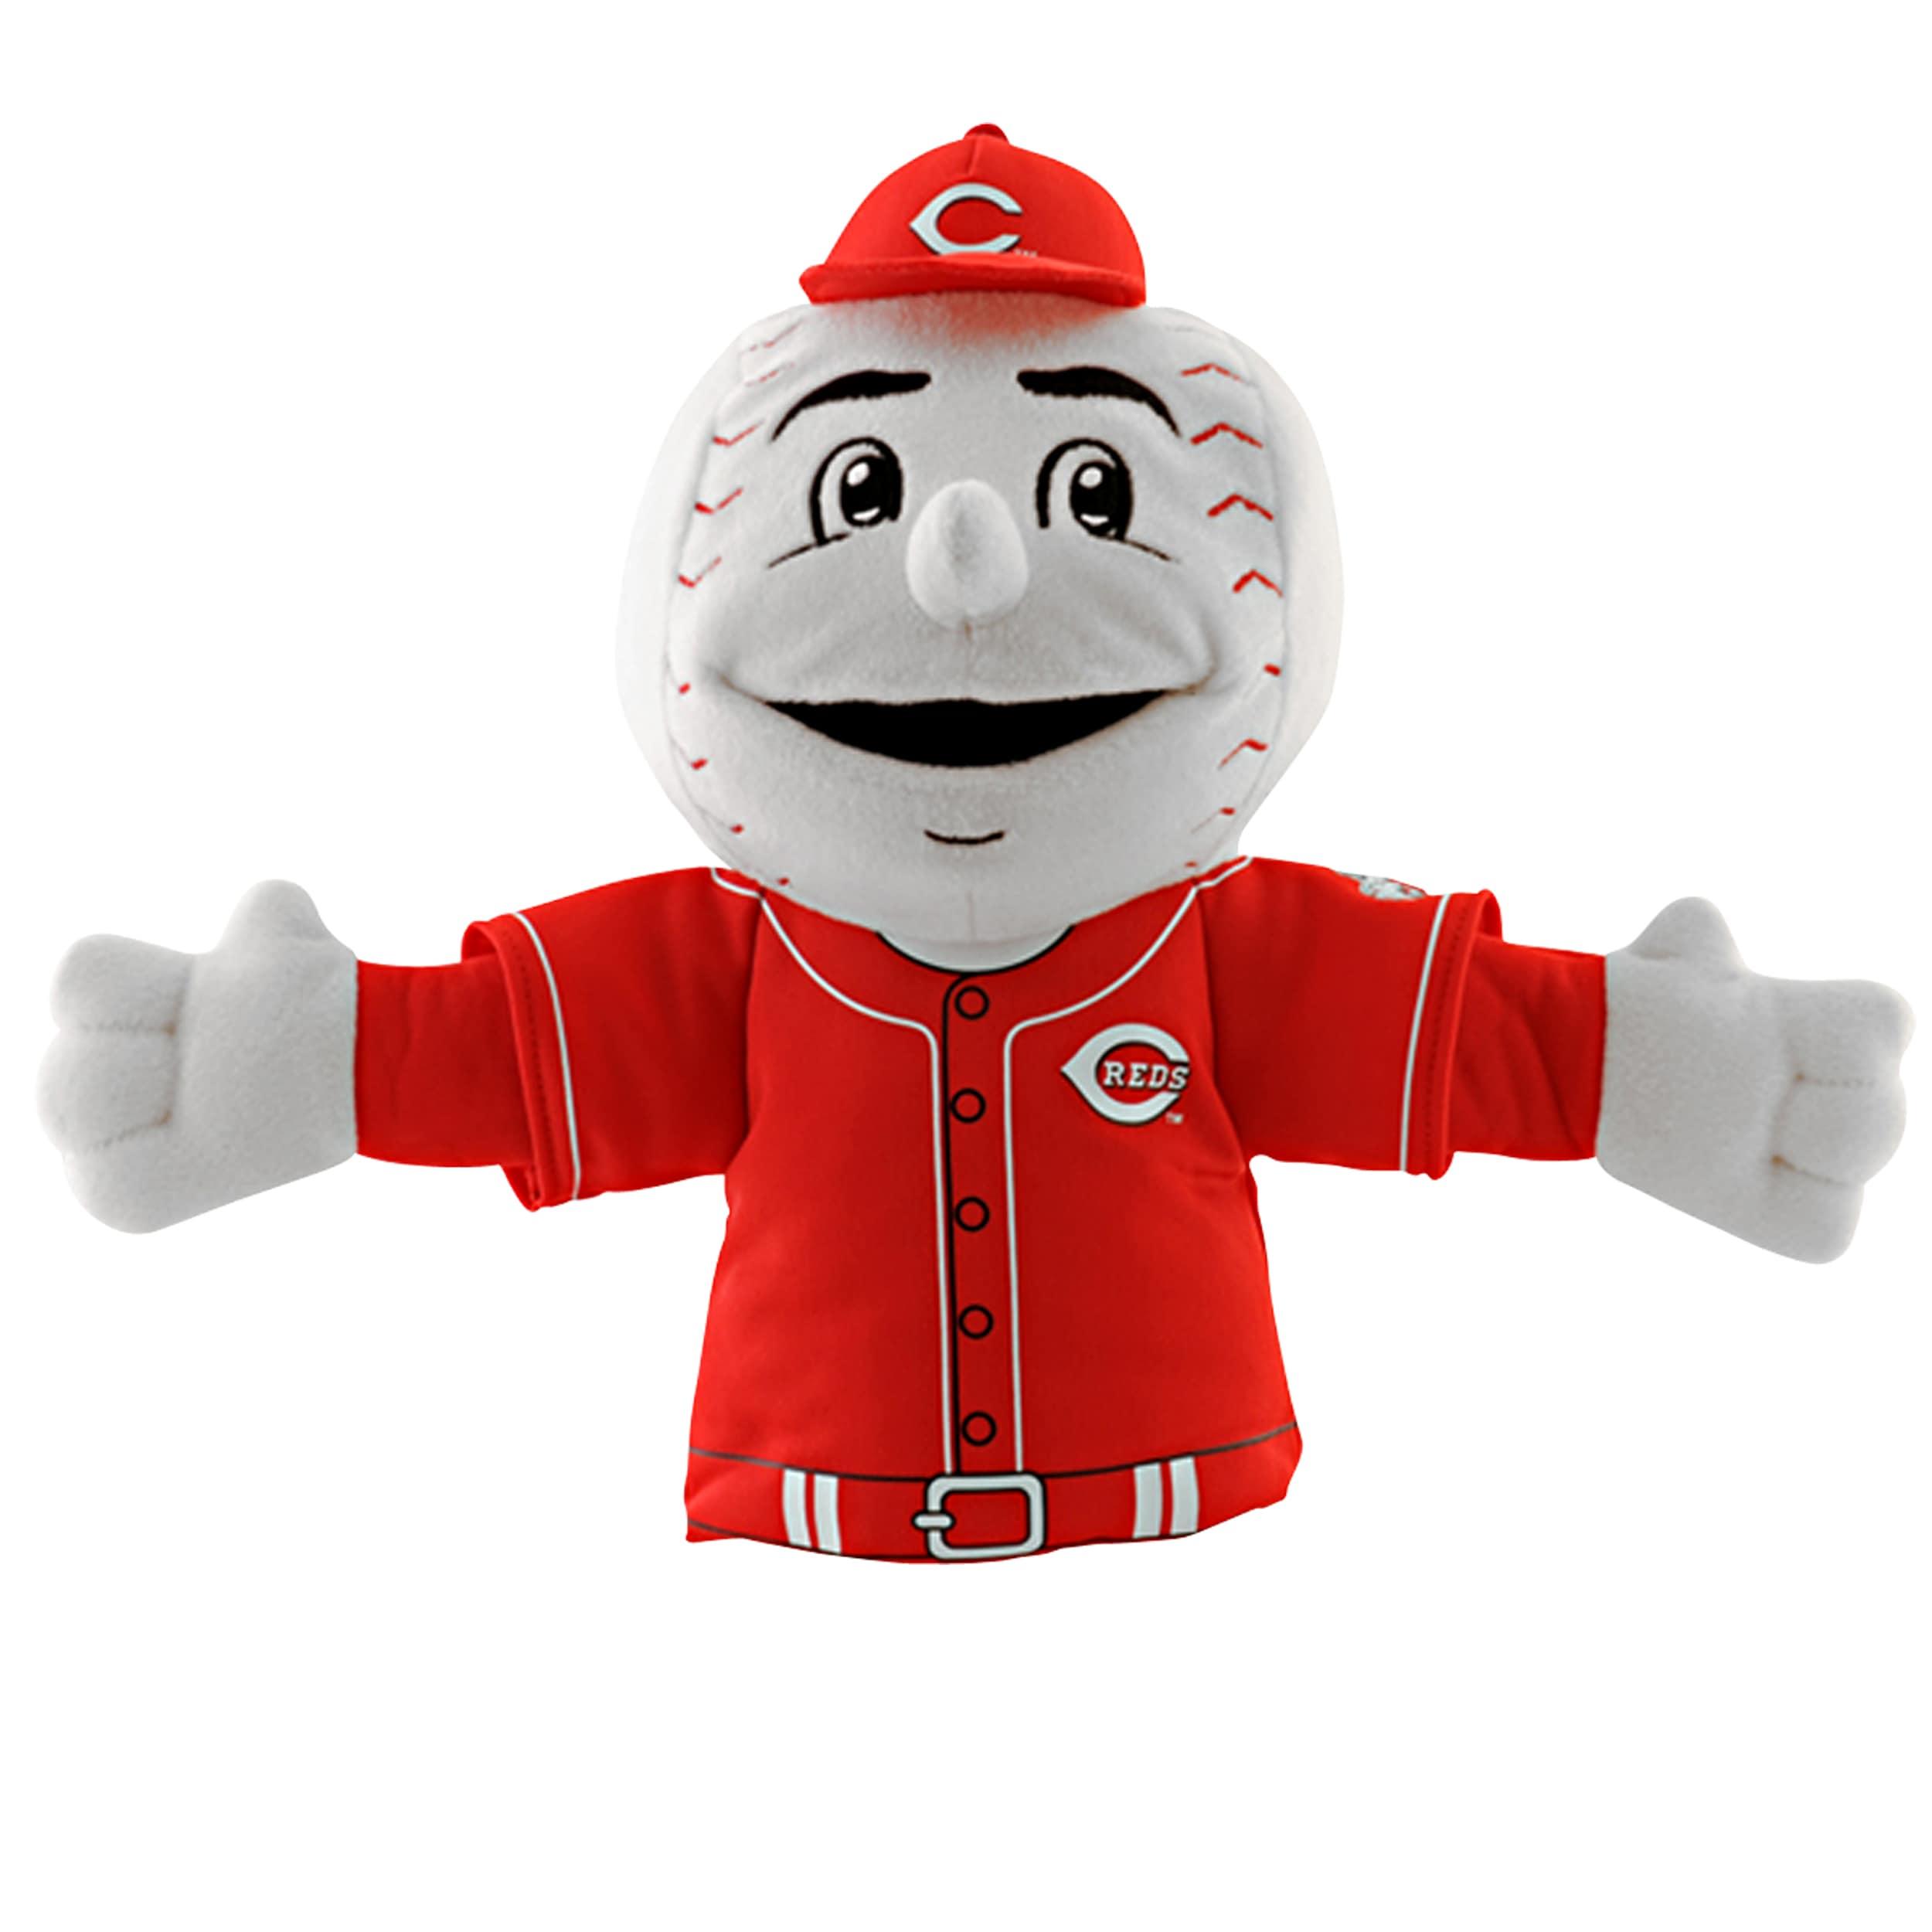 Cincinnati Reds 'Mr. Red' Mascot Hand Puppet